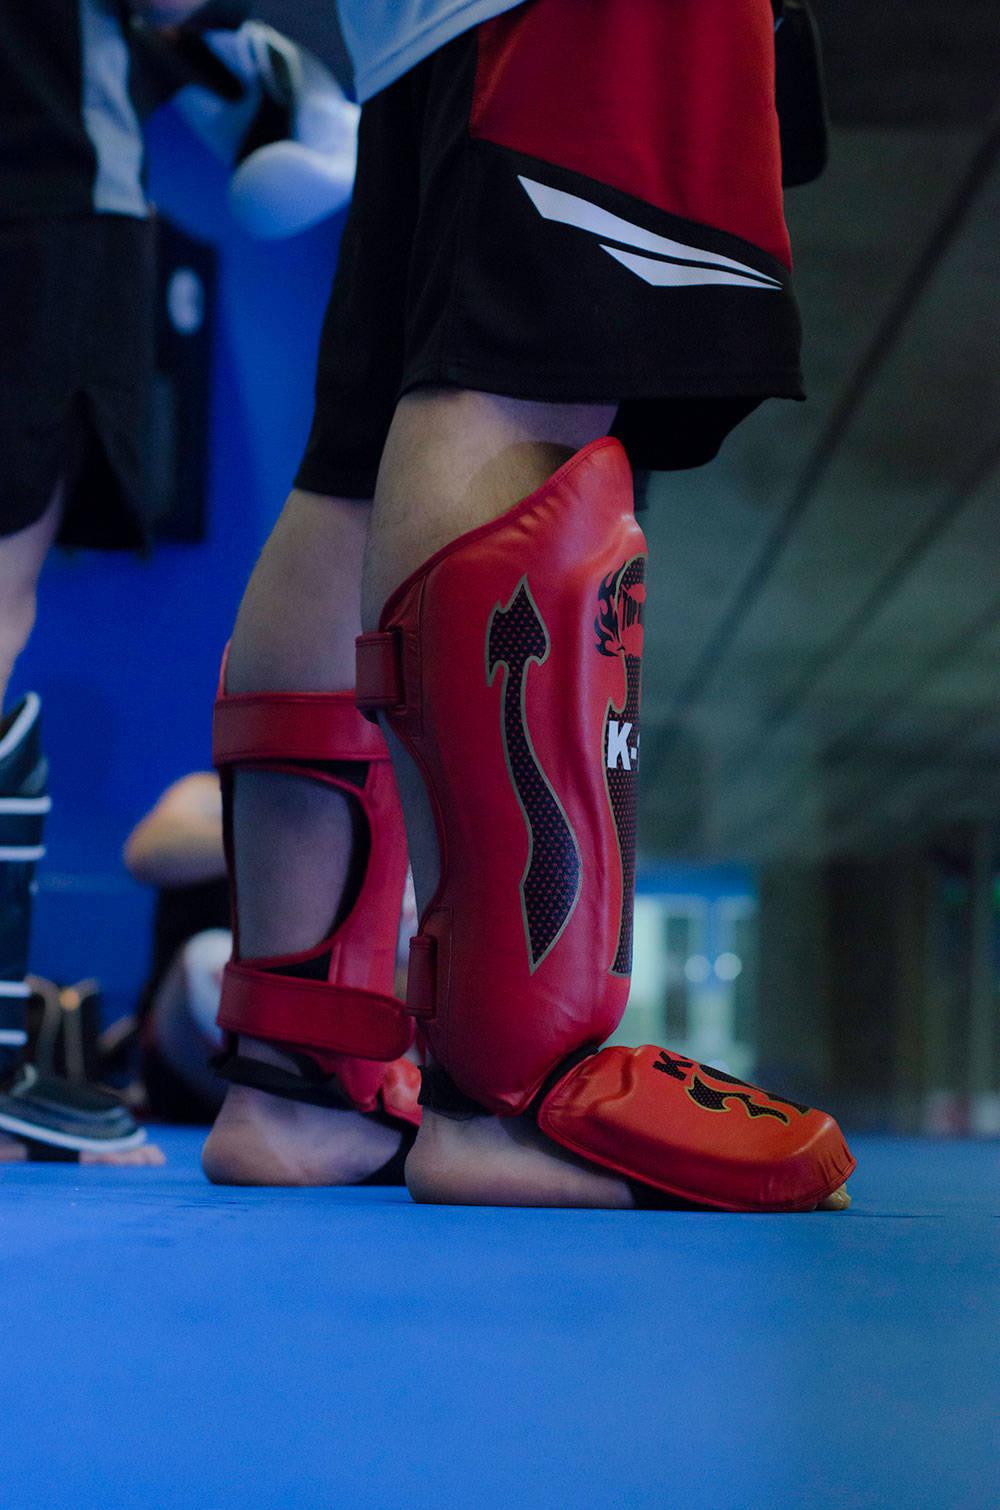 kickboxing-02.jpg